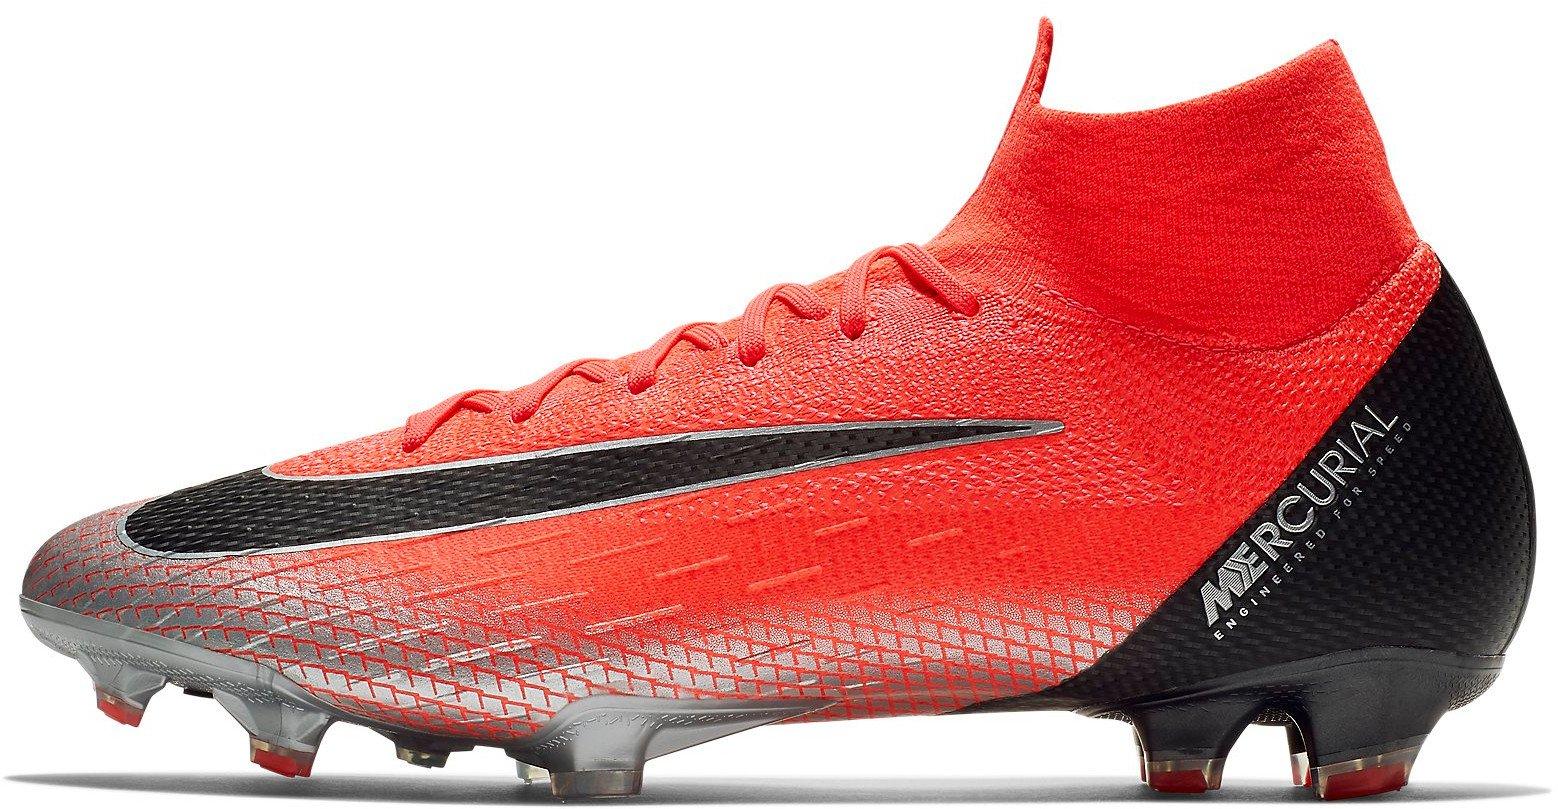 bad3b877a4e32 Kopačky Nike MERCURIAL SUPERFLY 360 ELITE CR7 FG - Top4Football.sk